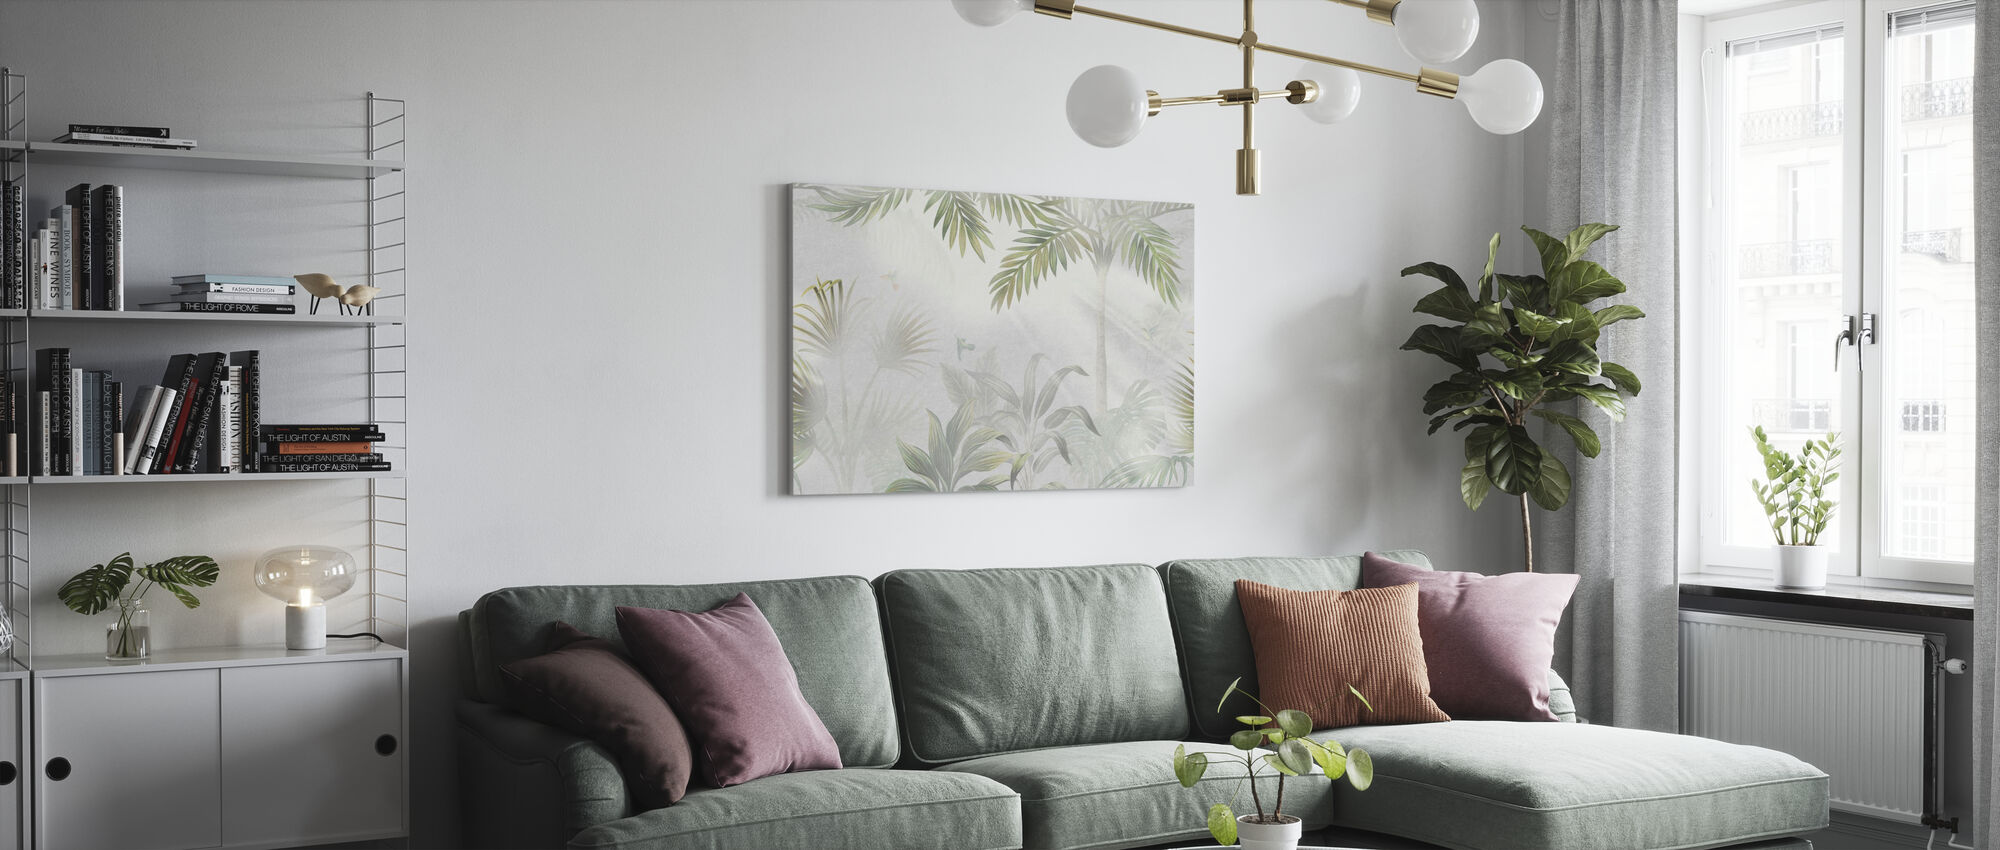 Foggy Jungle - Olive - Canvas print - Living Room